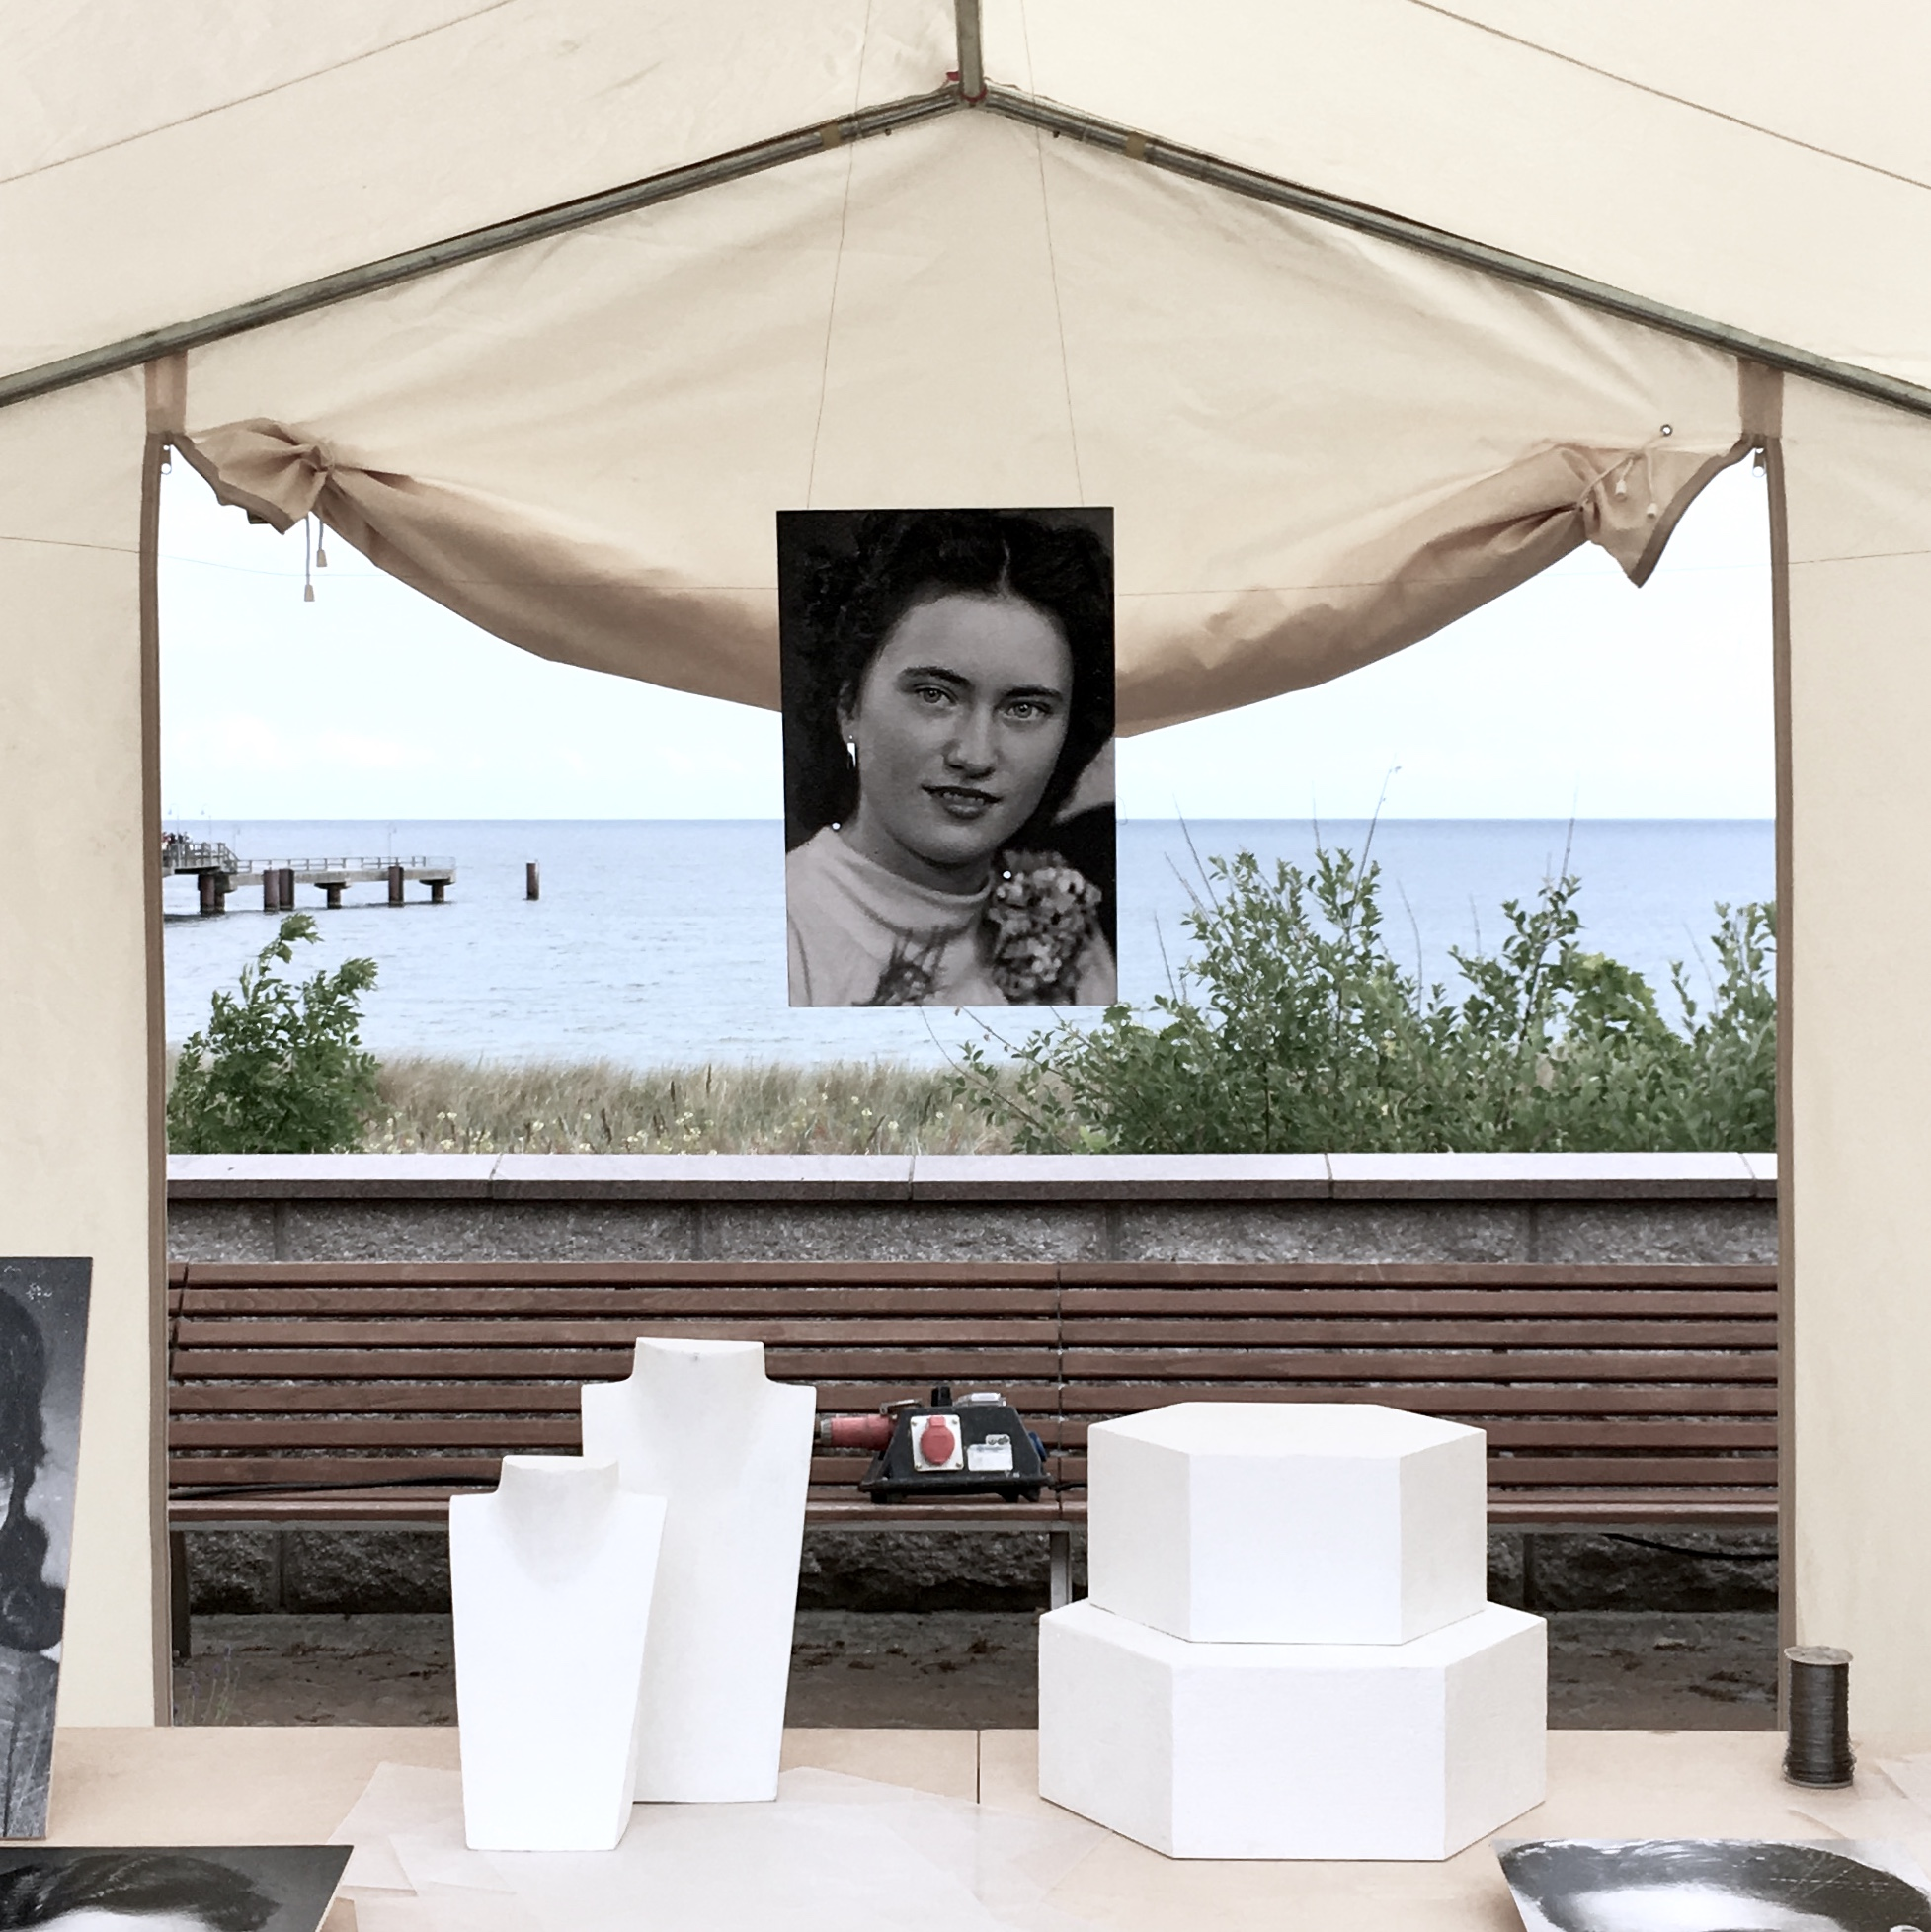 Schöne Dinge & Meer - auf Norderney